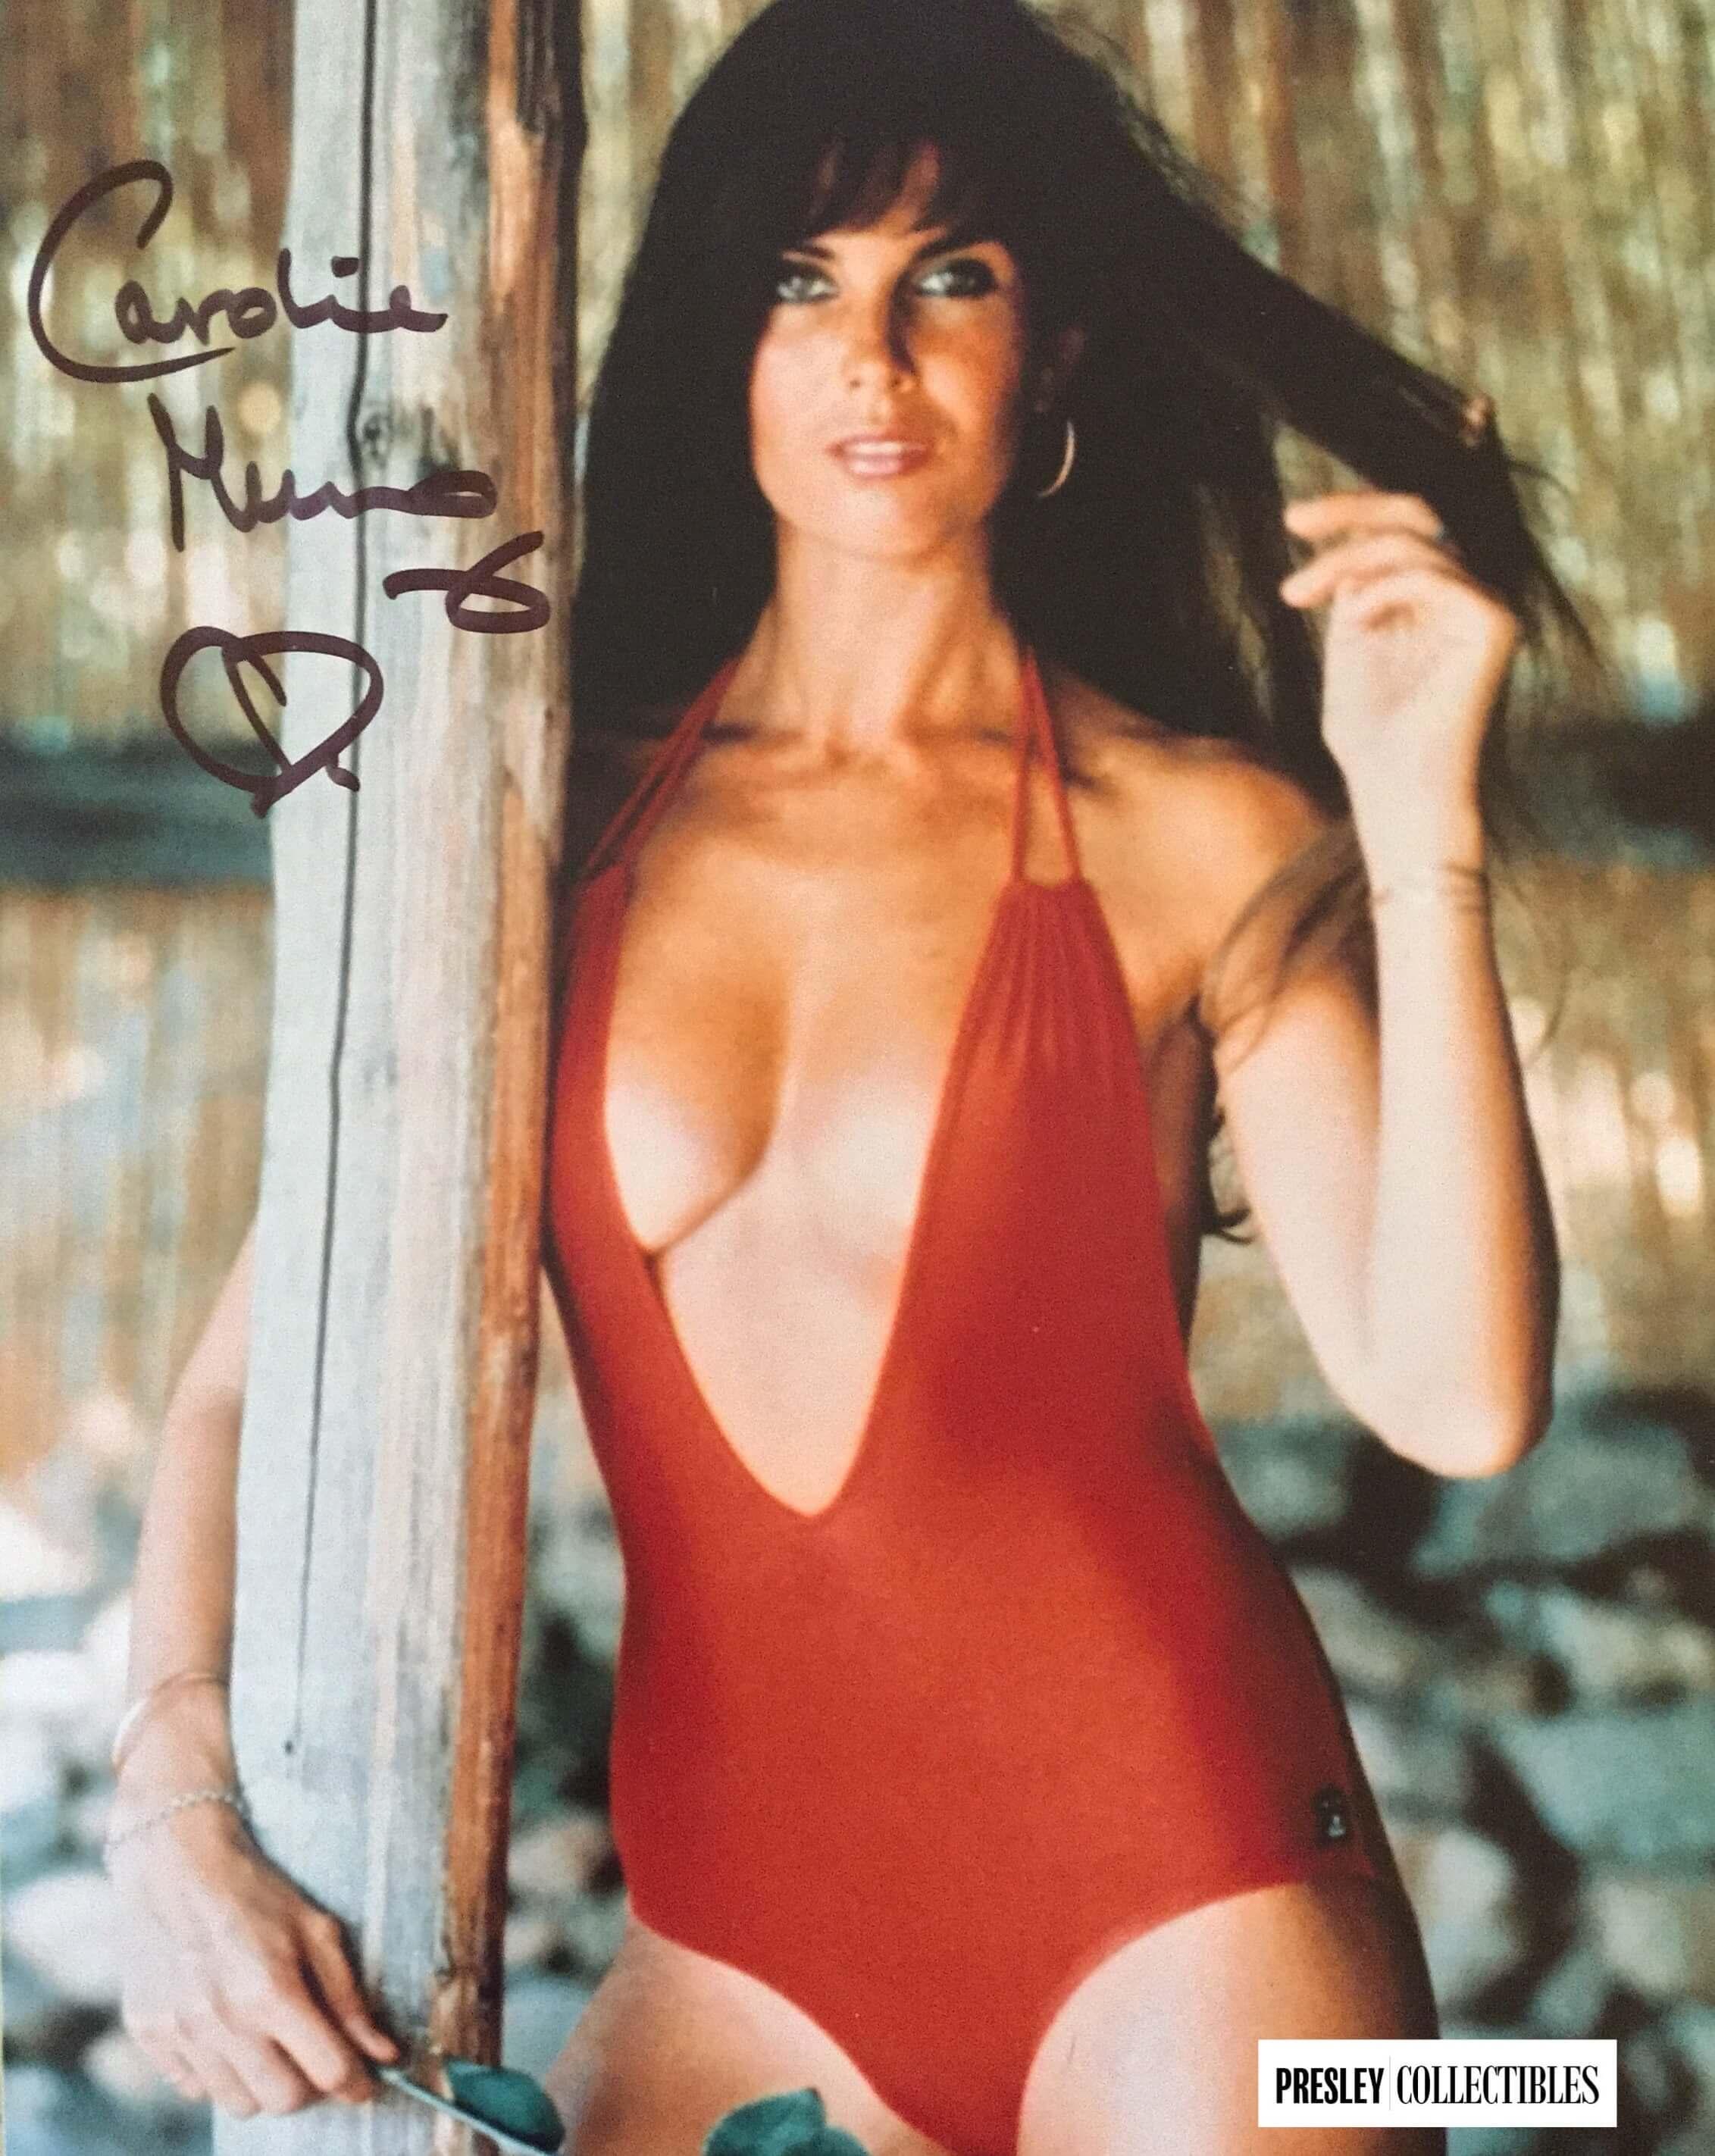 Caroline Munro (born 1949)